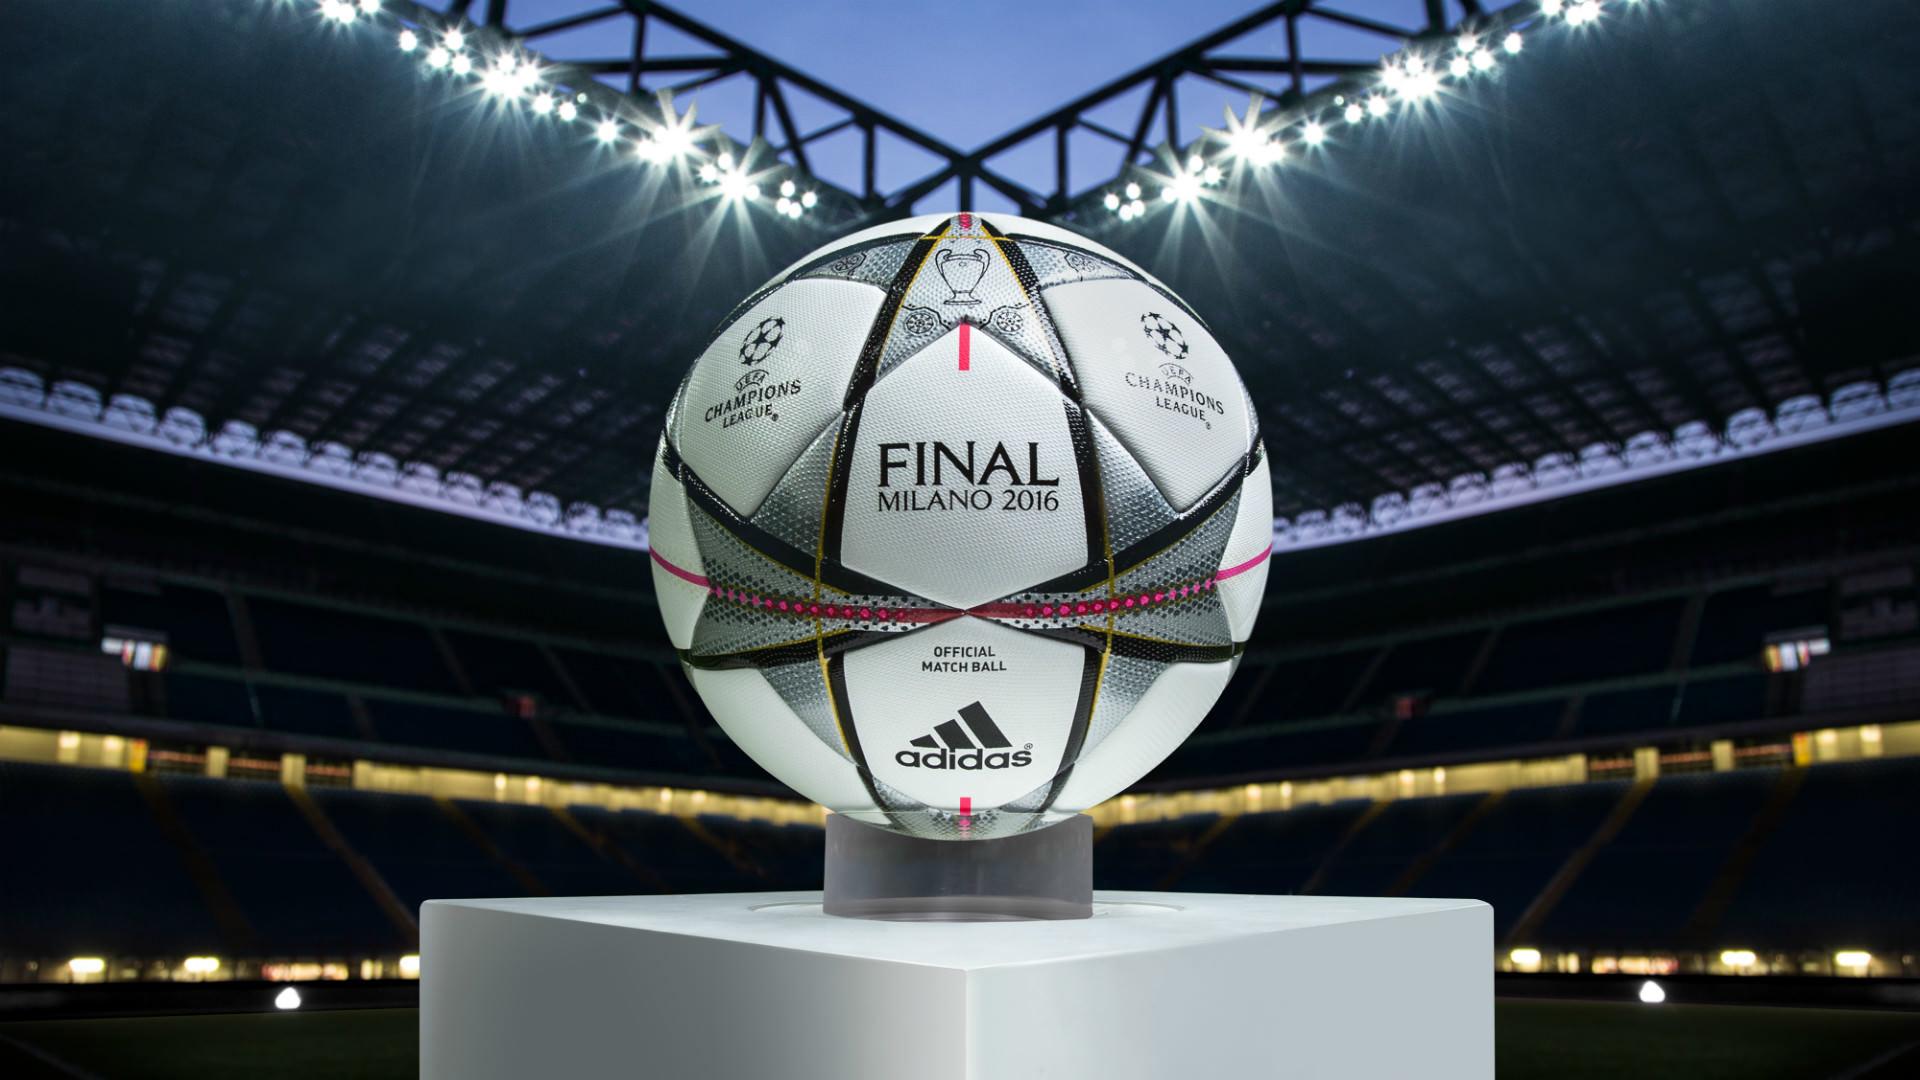 Champions League Final 2016 Milano Wallpaper